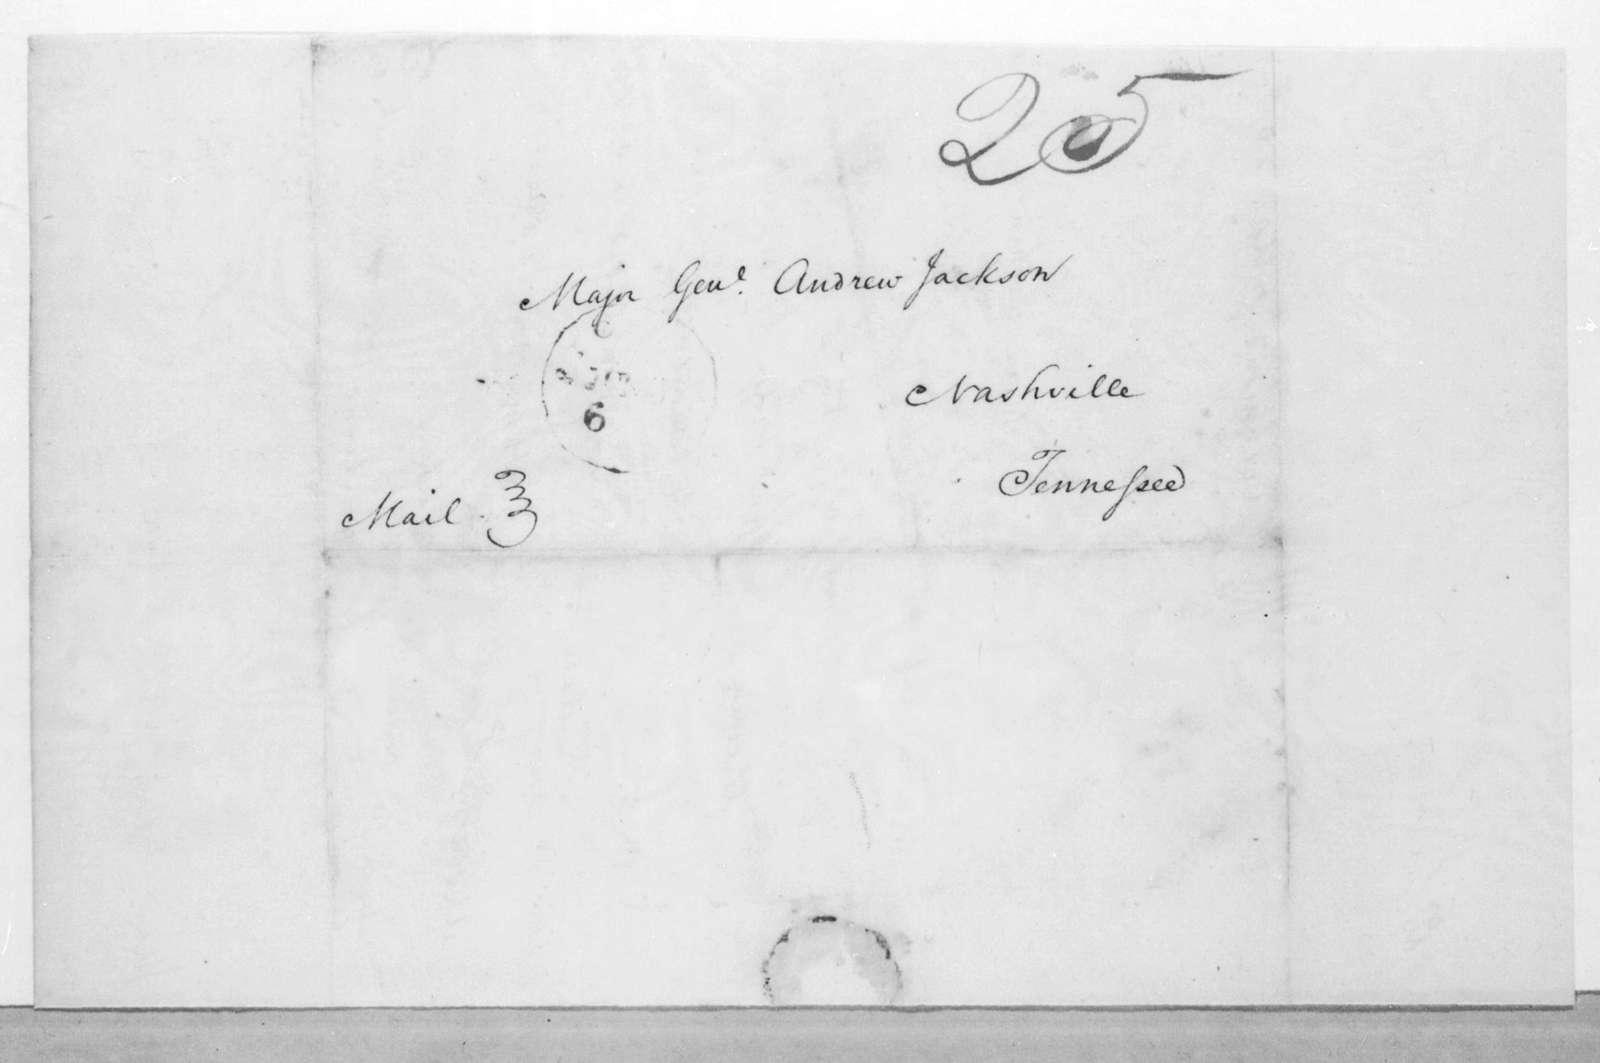 William O. Winston to Andrew Jackson, May 28, 1816